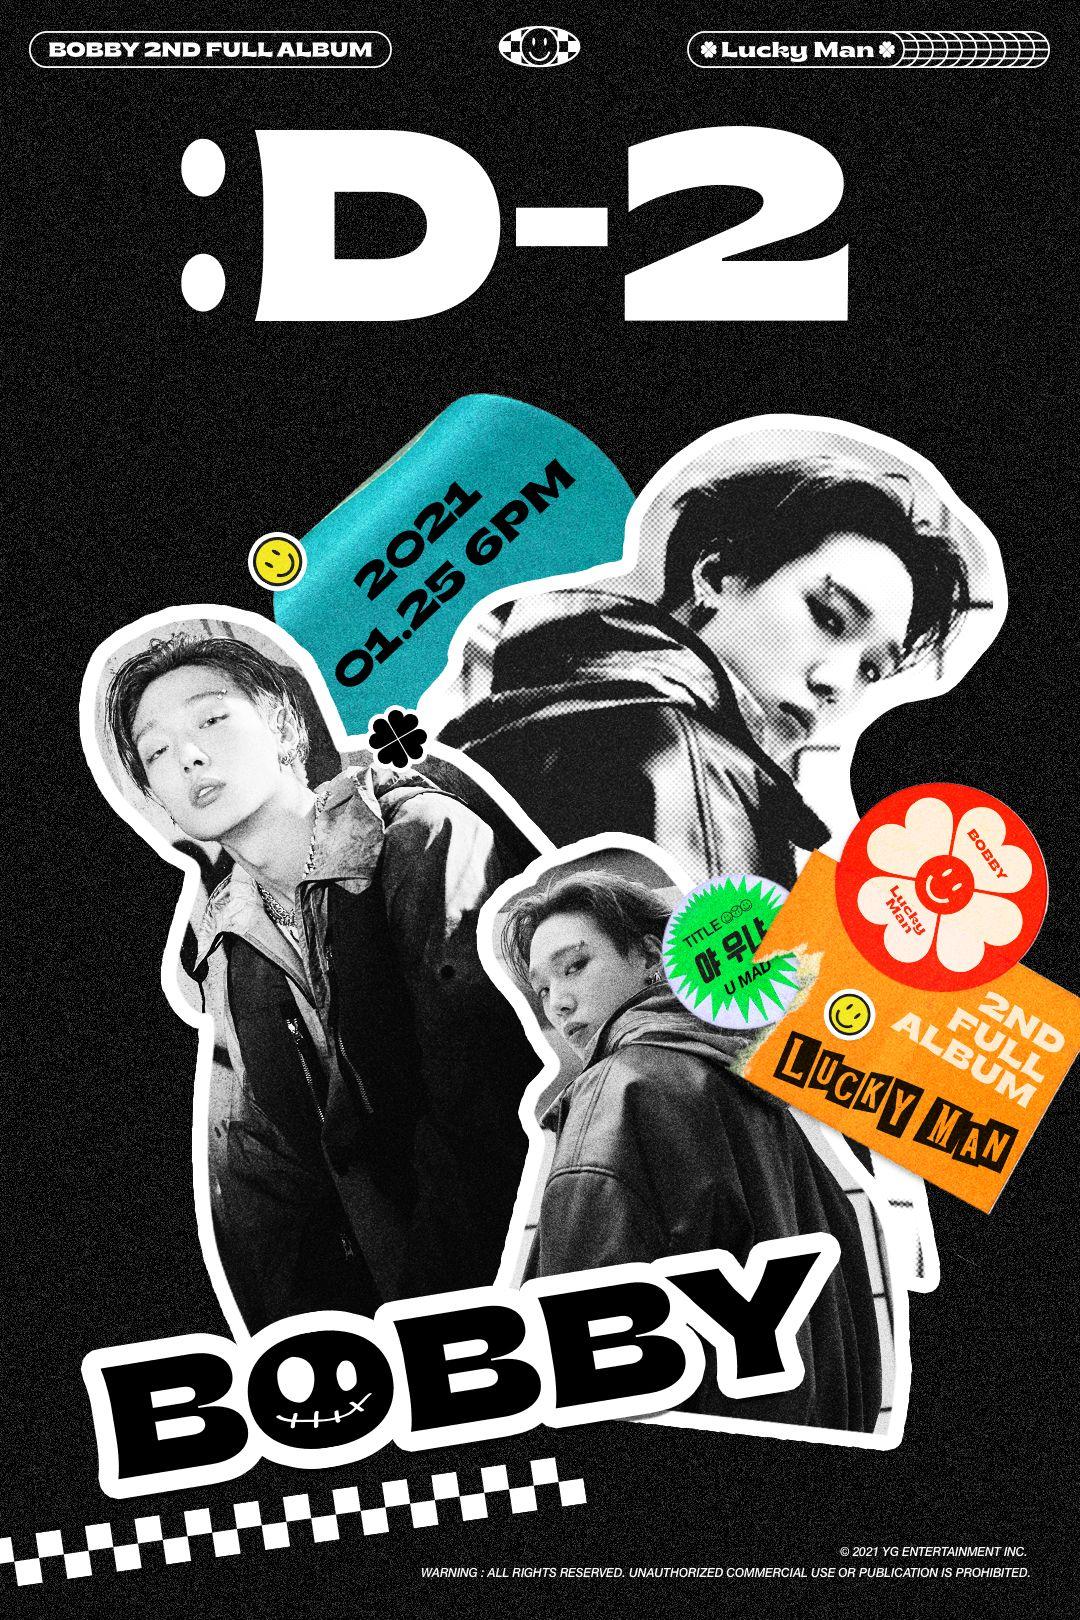 Lucky Man Album Kpop Journal Stickers BOBBY